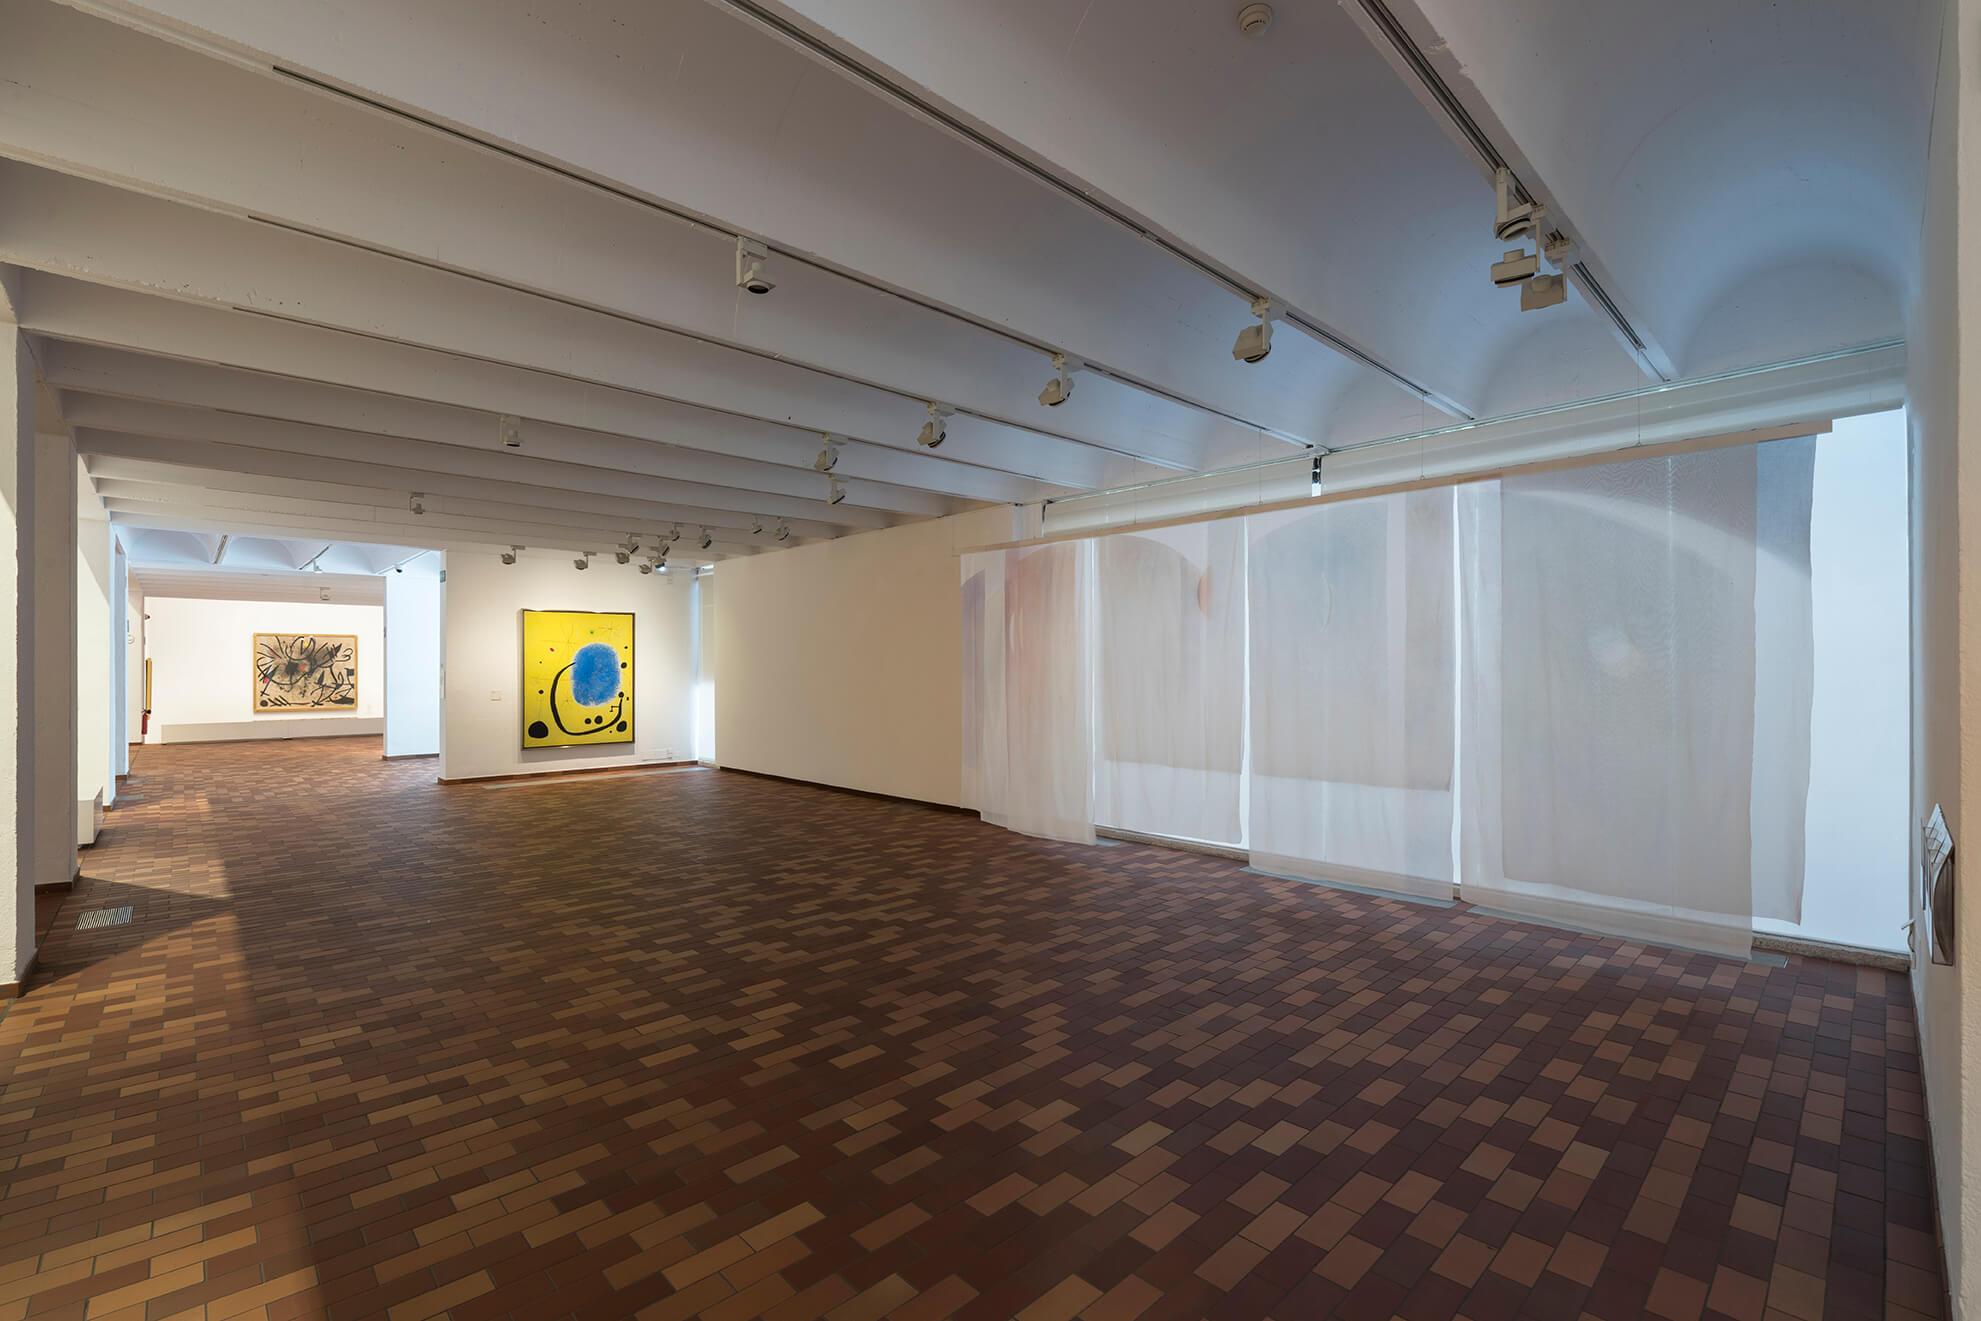 Installation view: Nadala, Fundació Miró, Barcelona, 2018 |  | ProjecteSD